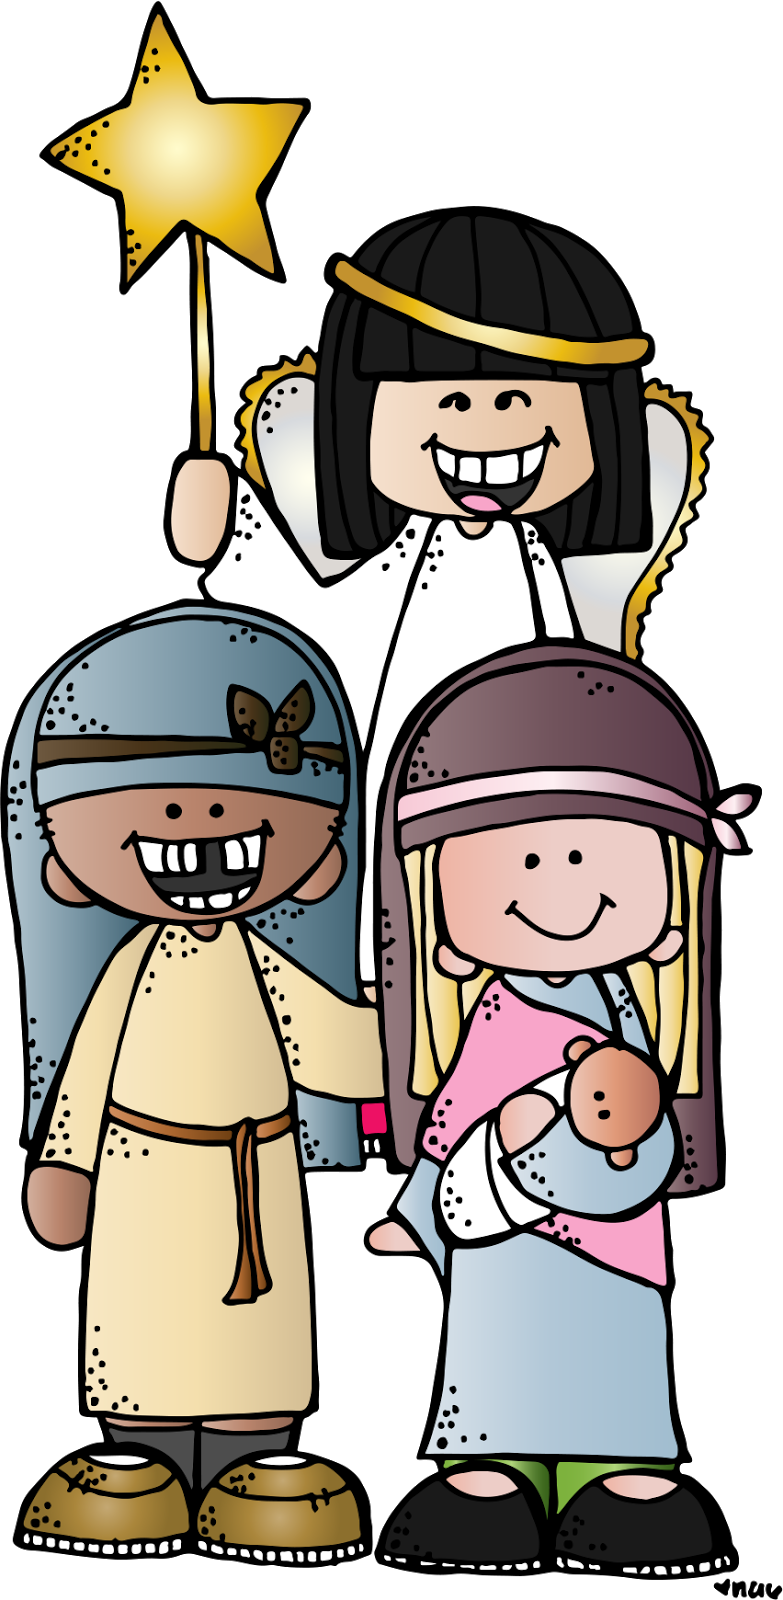 783x1600 Melonheadz Lds Illustrating Adviento Christmas Eve